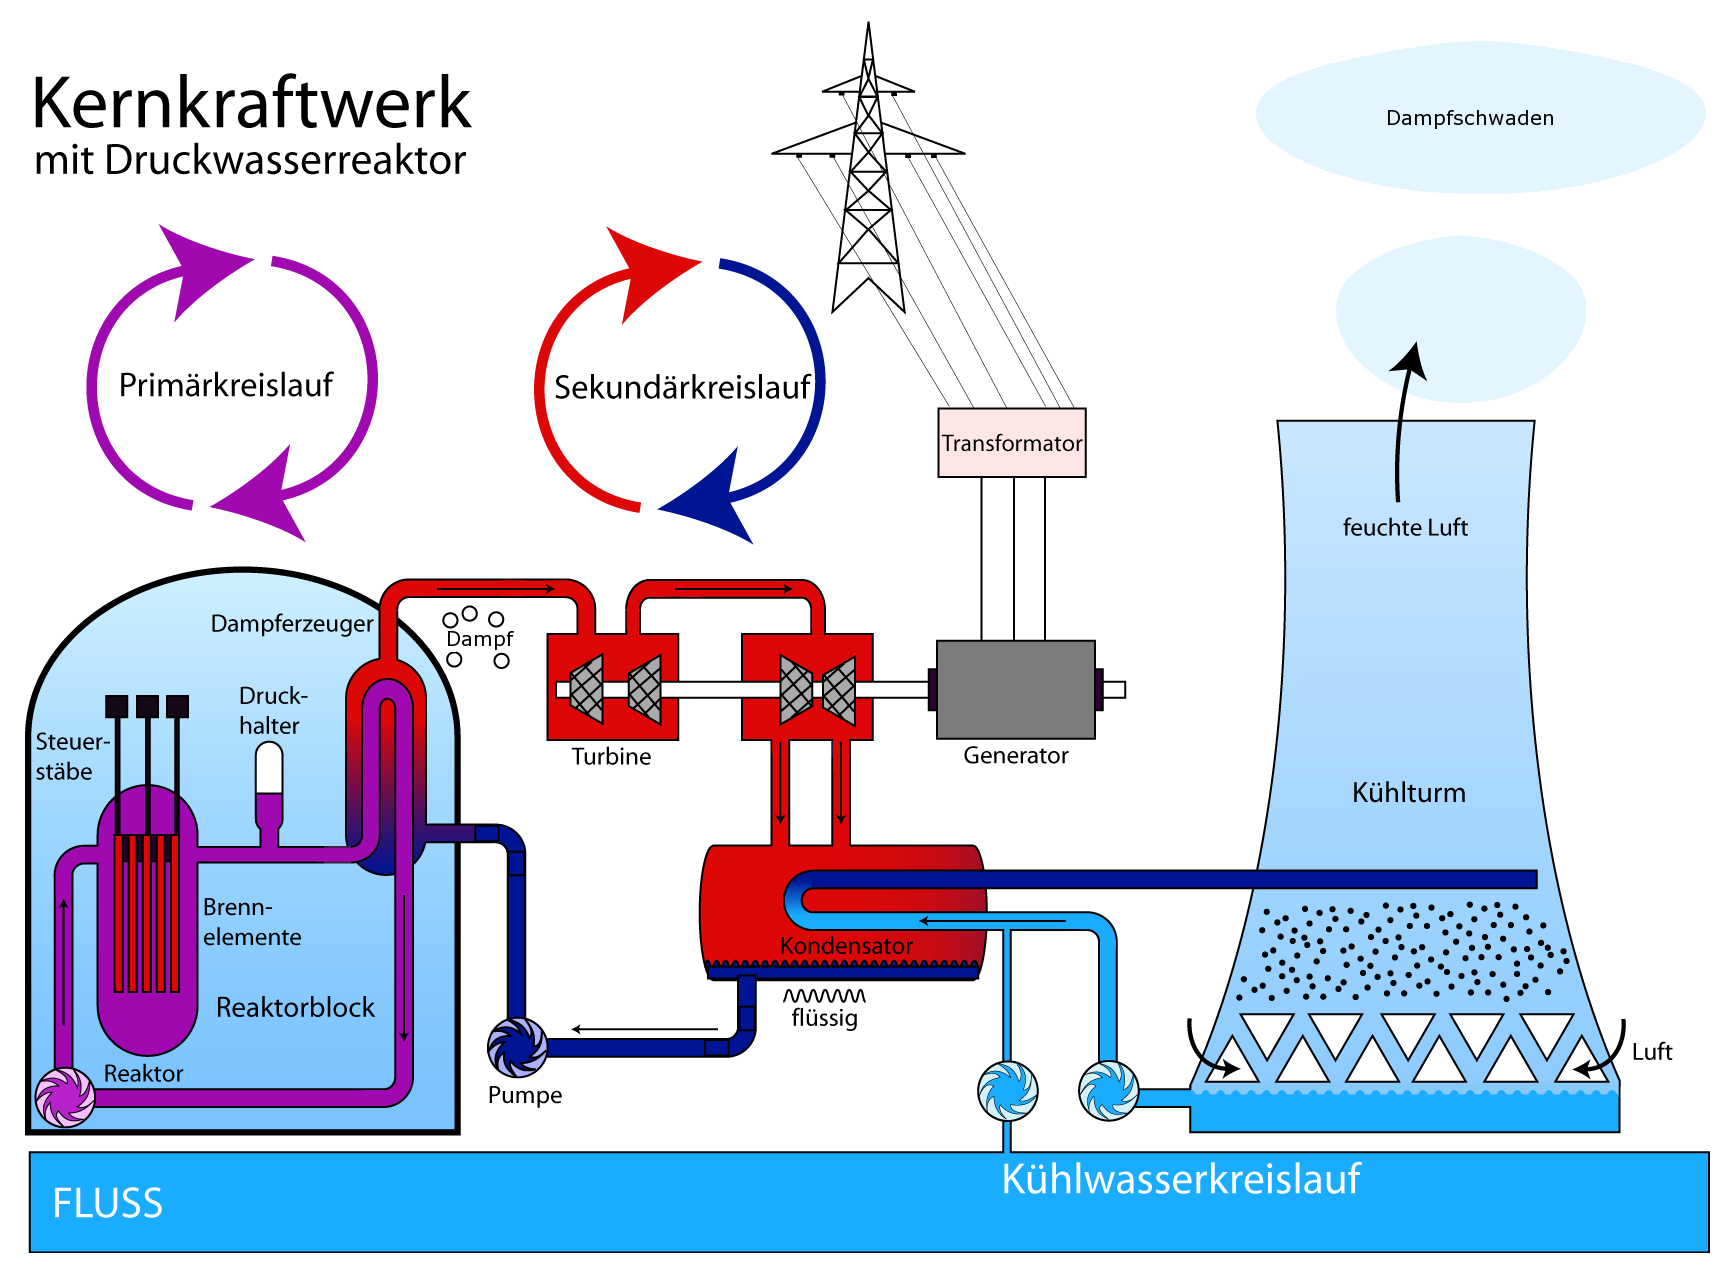 File:Kernkraftwerk Druckwasserreaktor n.png - Wikimedia Commons